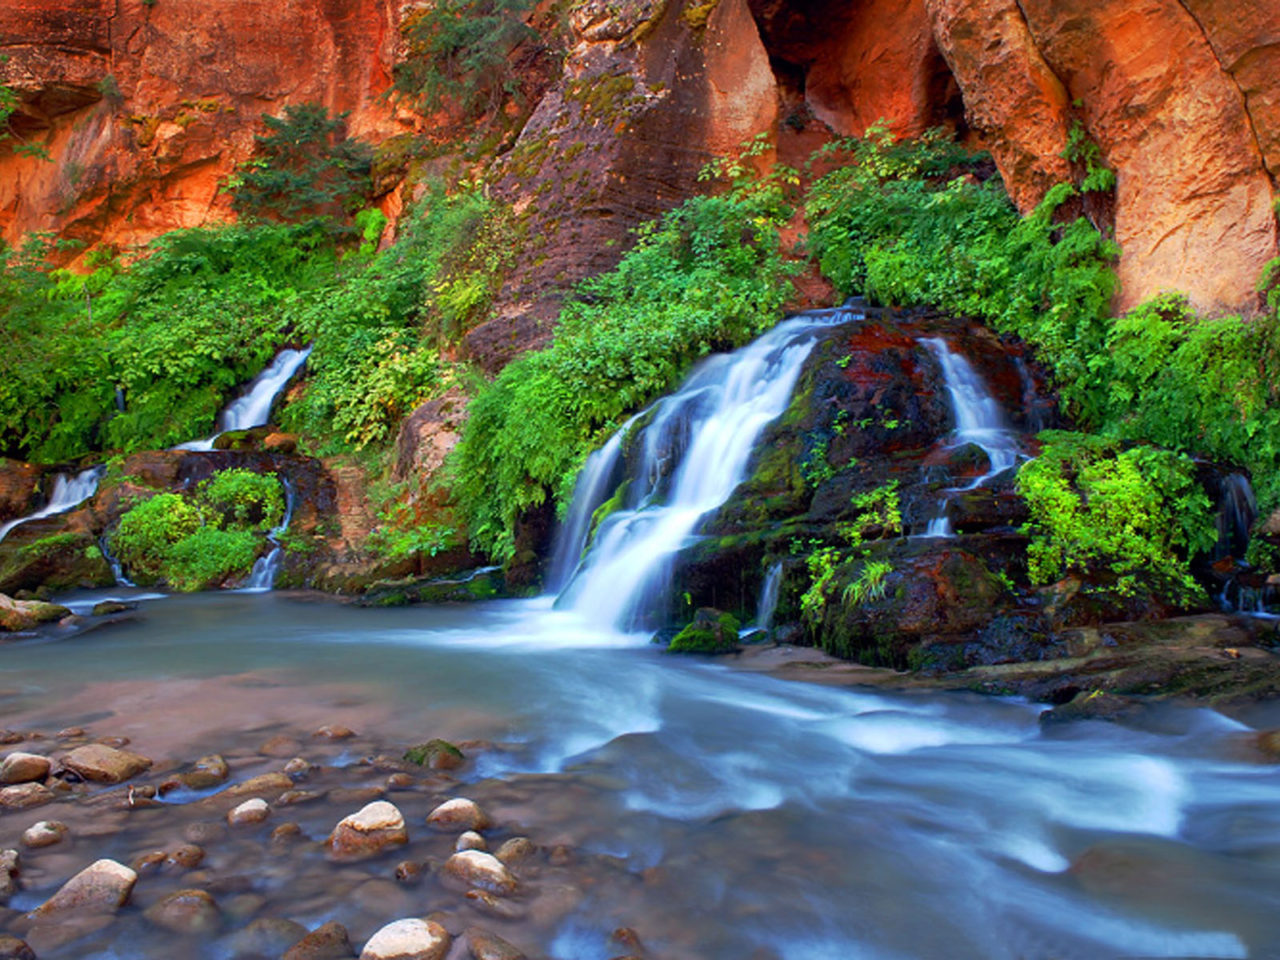 Falls Hd Wallpaper Free Download The Narrows Zion National Park Arizona United States